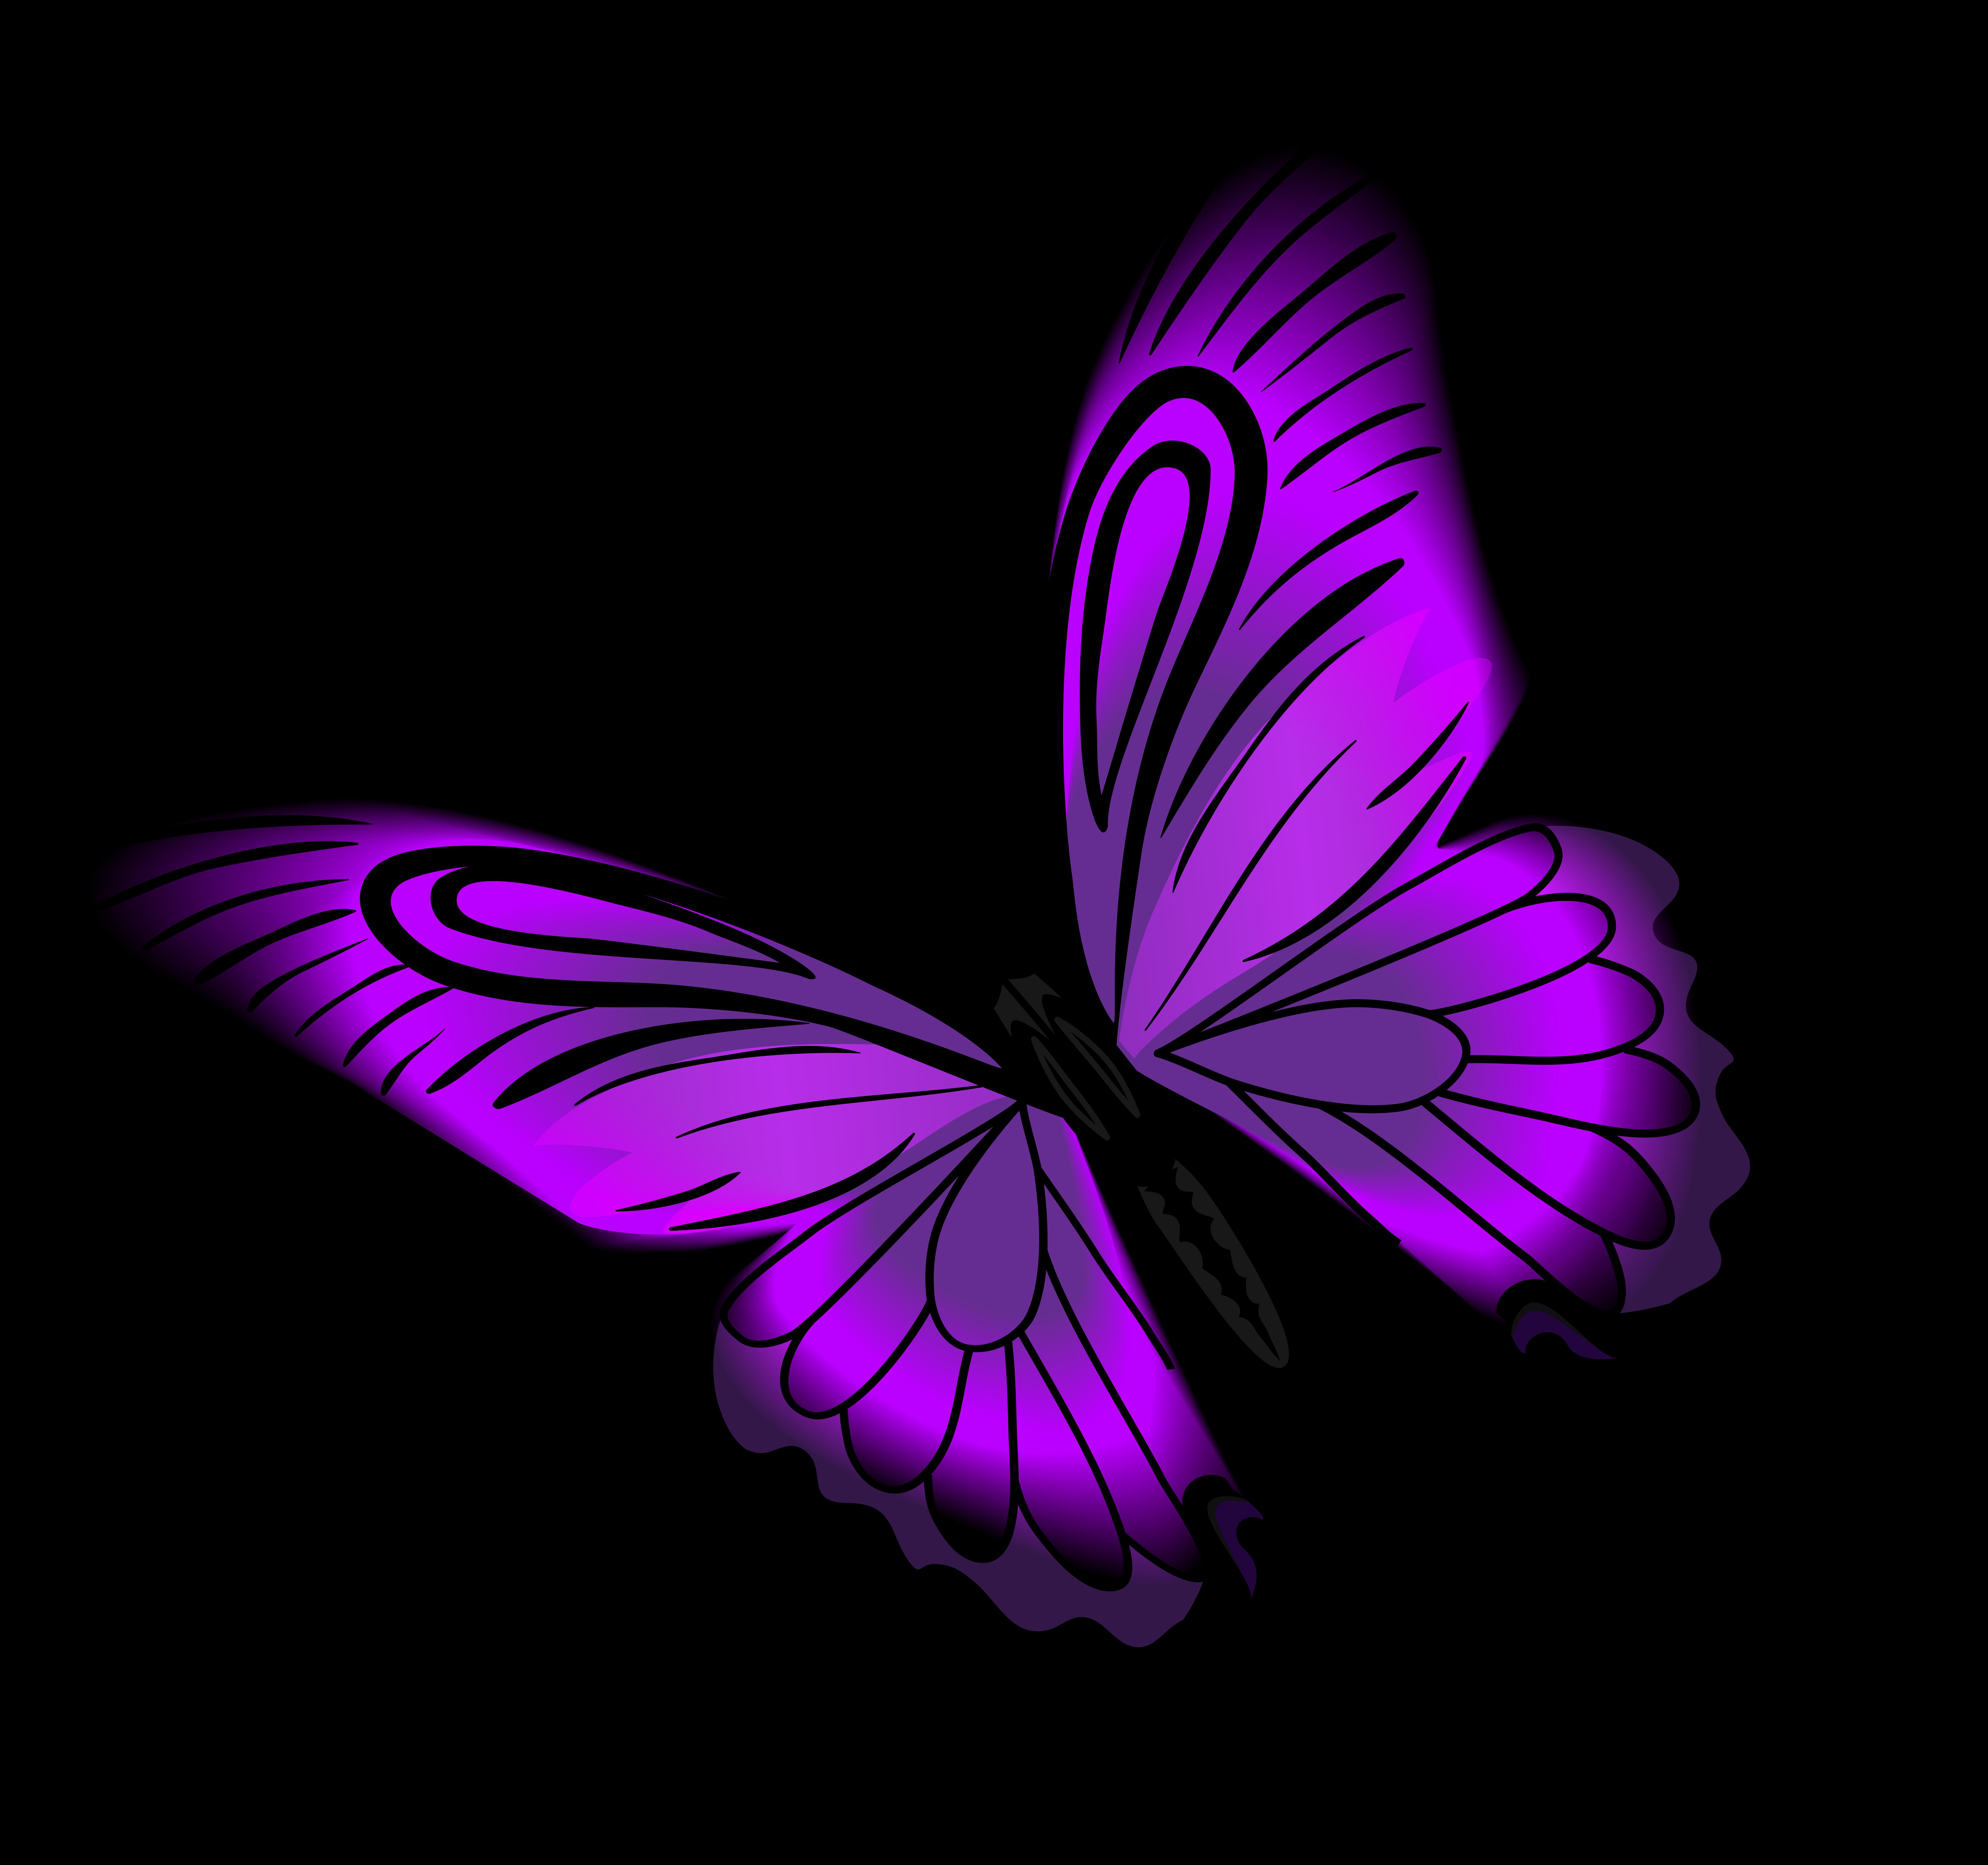 Бабочки рисунок на прозрачном фоне, козлятки для